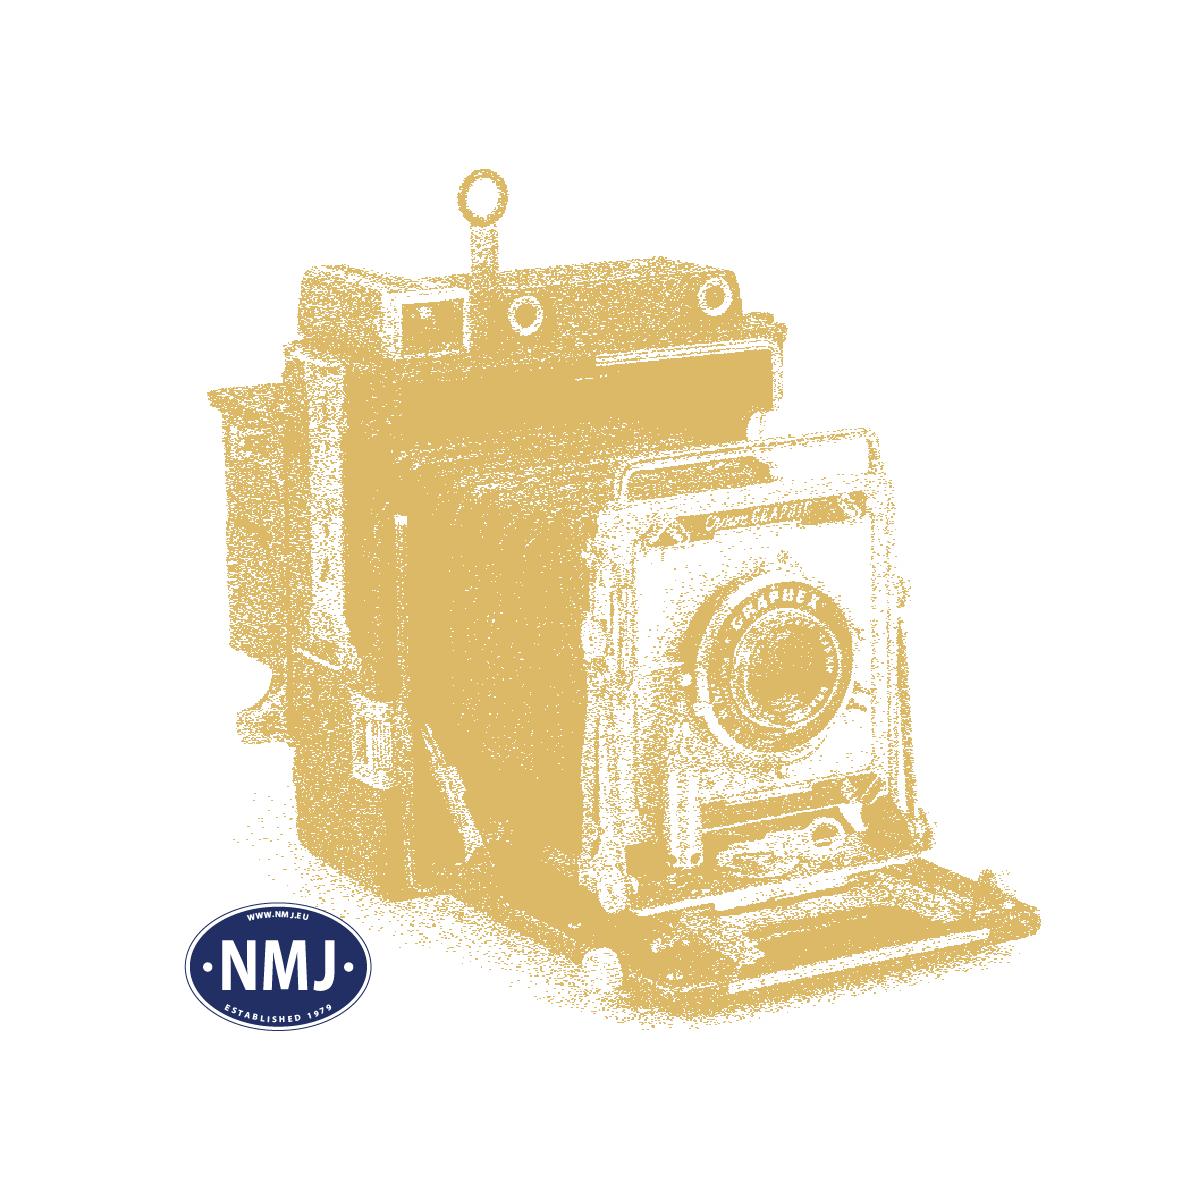 NMJTKAT17 - NMJ Topline and Skyline Catalogue 2017